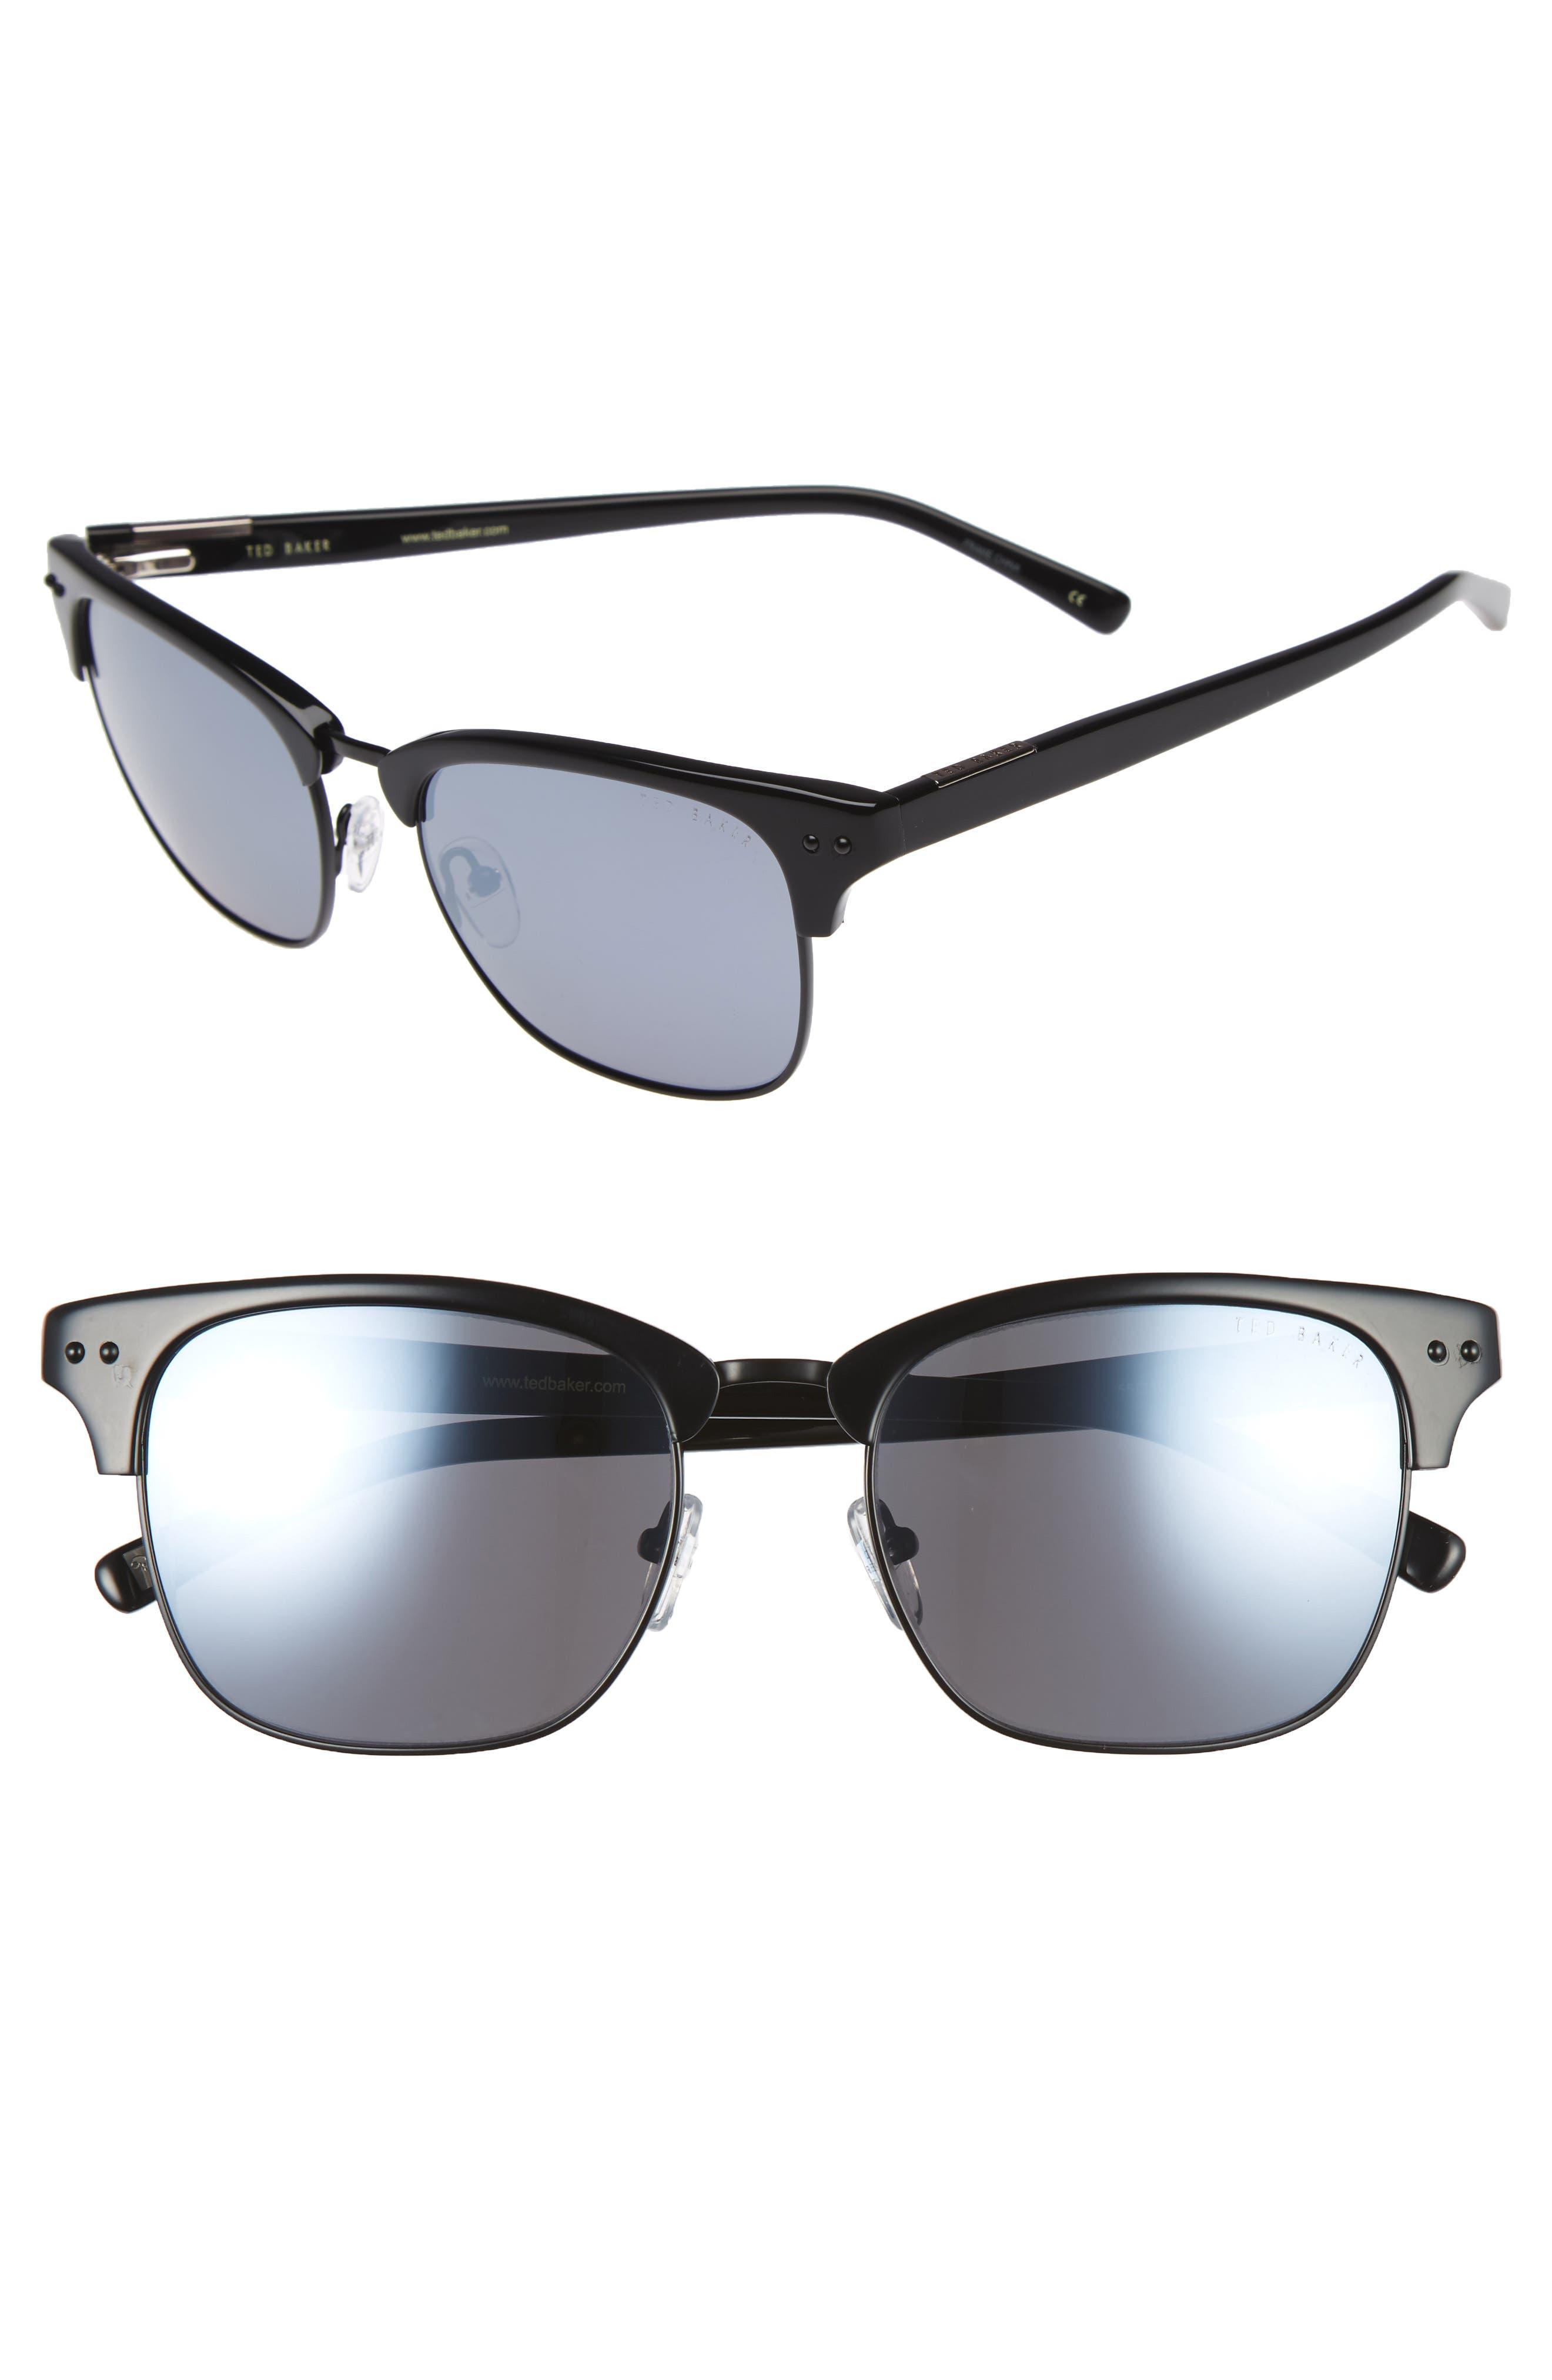 Main Image - Ted Baker London 55mm Polarized Browline Sunglasses